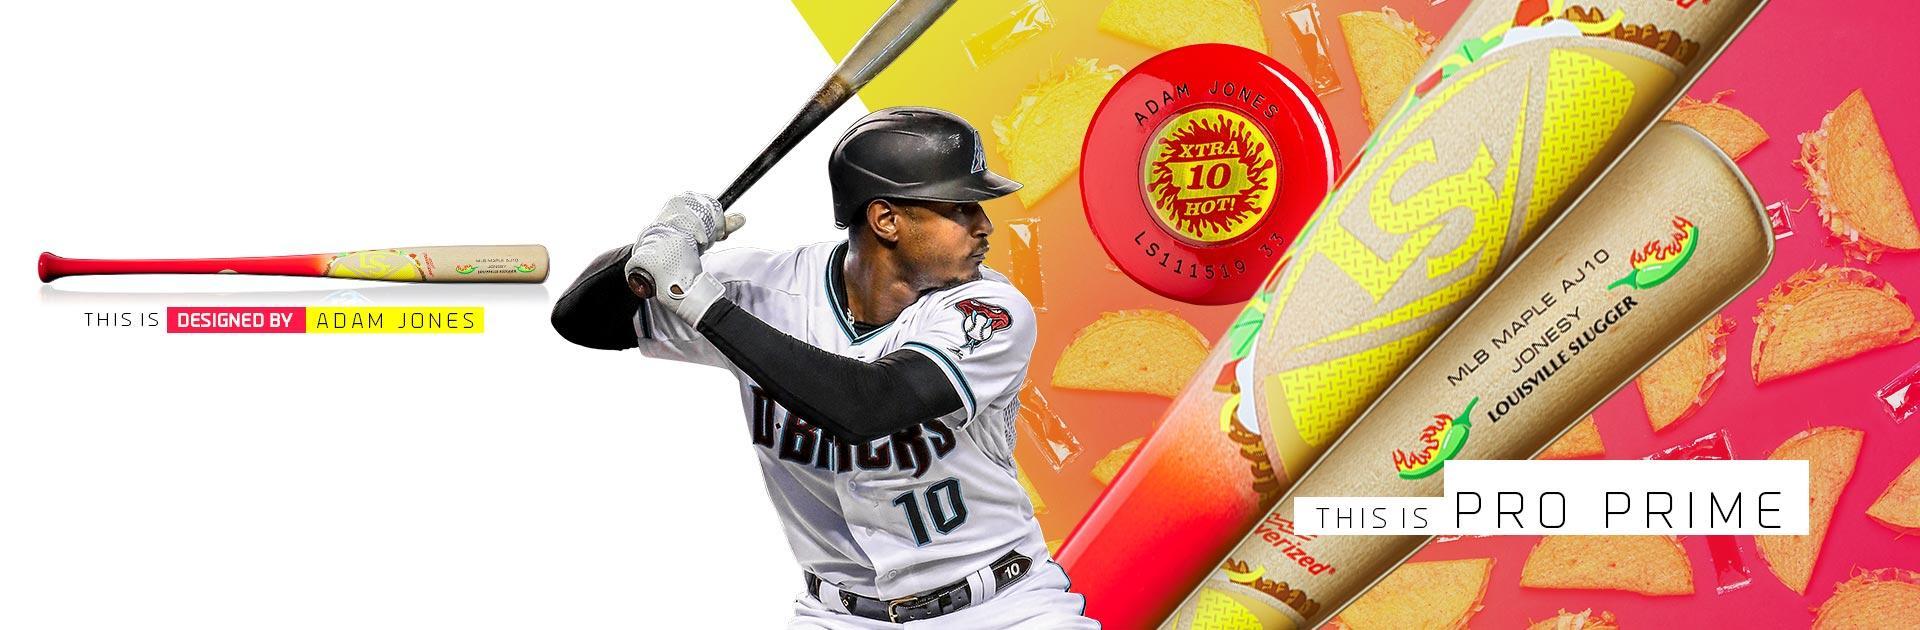 Adam Jones' Pro Prime Baseball Bat